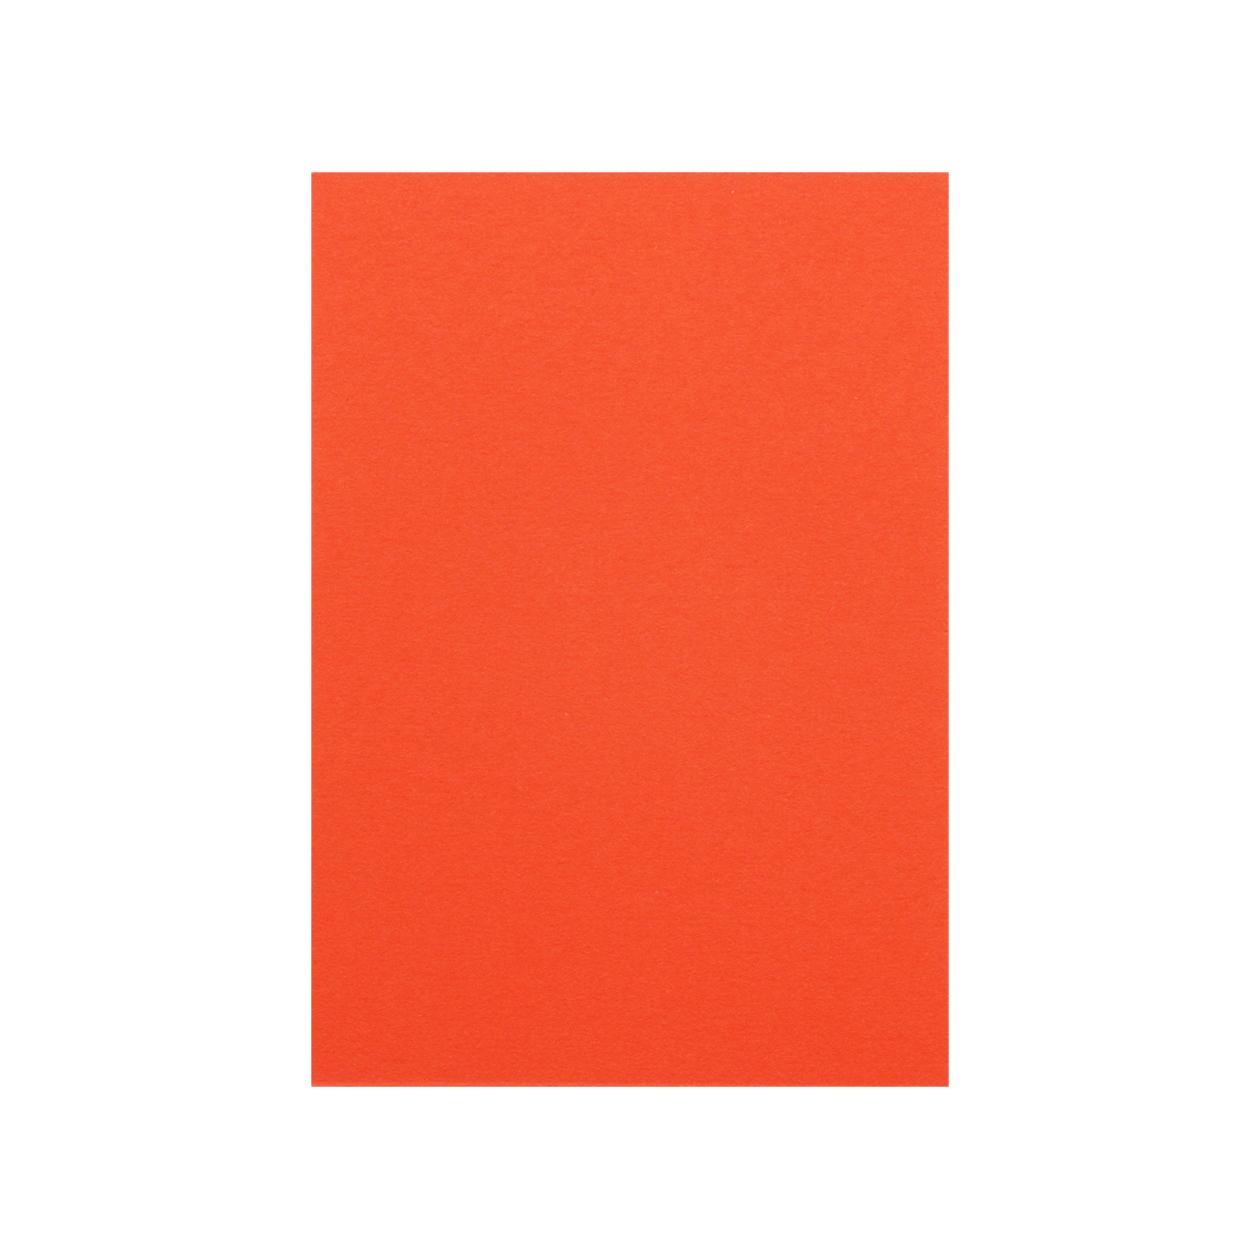 Pカード 二層合紙 朱×スノーホワイト